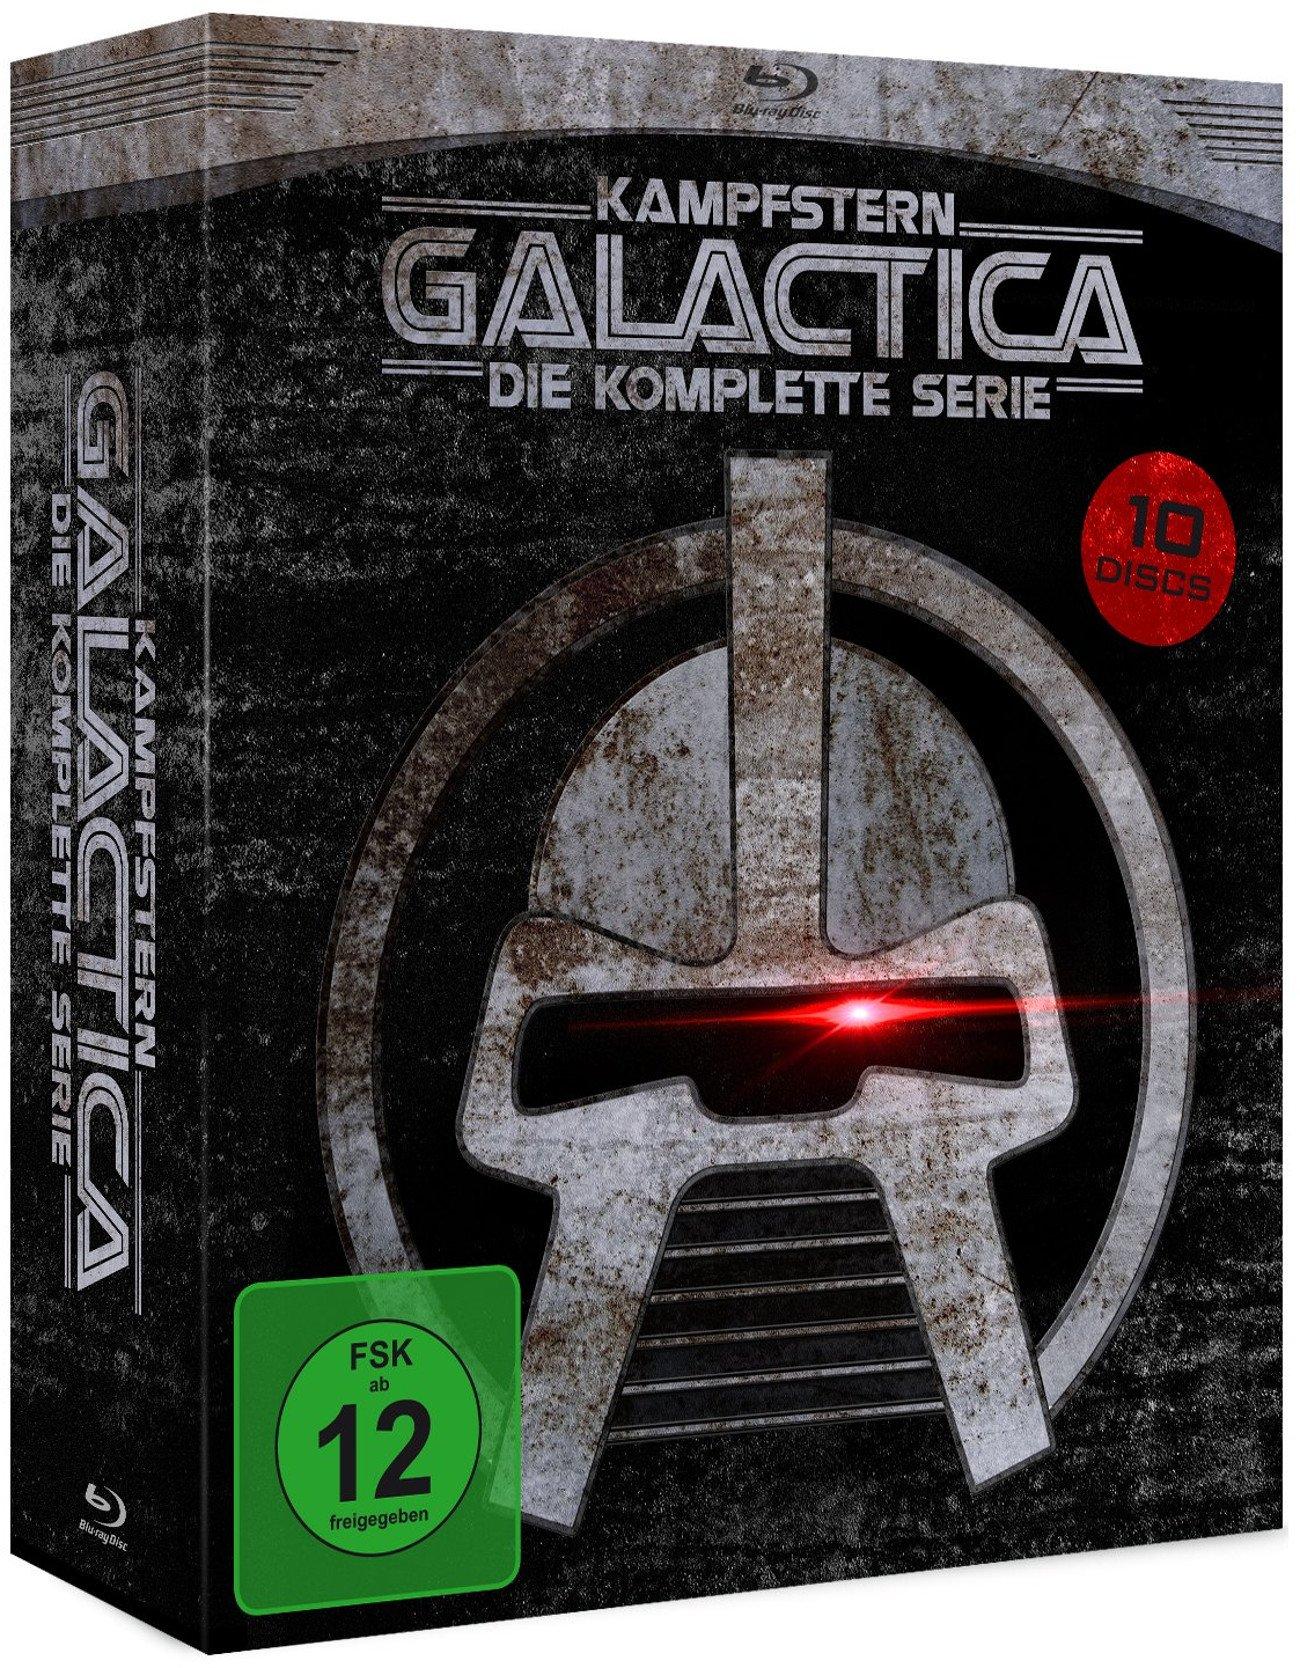 Battlestar Galactica / Galactica 1980 : The Complete Series (9 Blu-ray + 1 DVD) (Import)